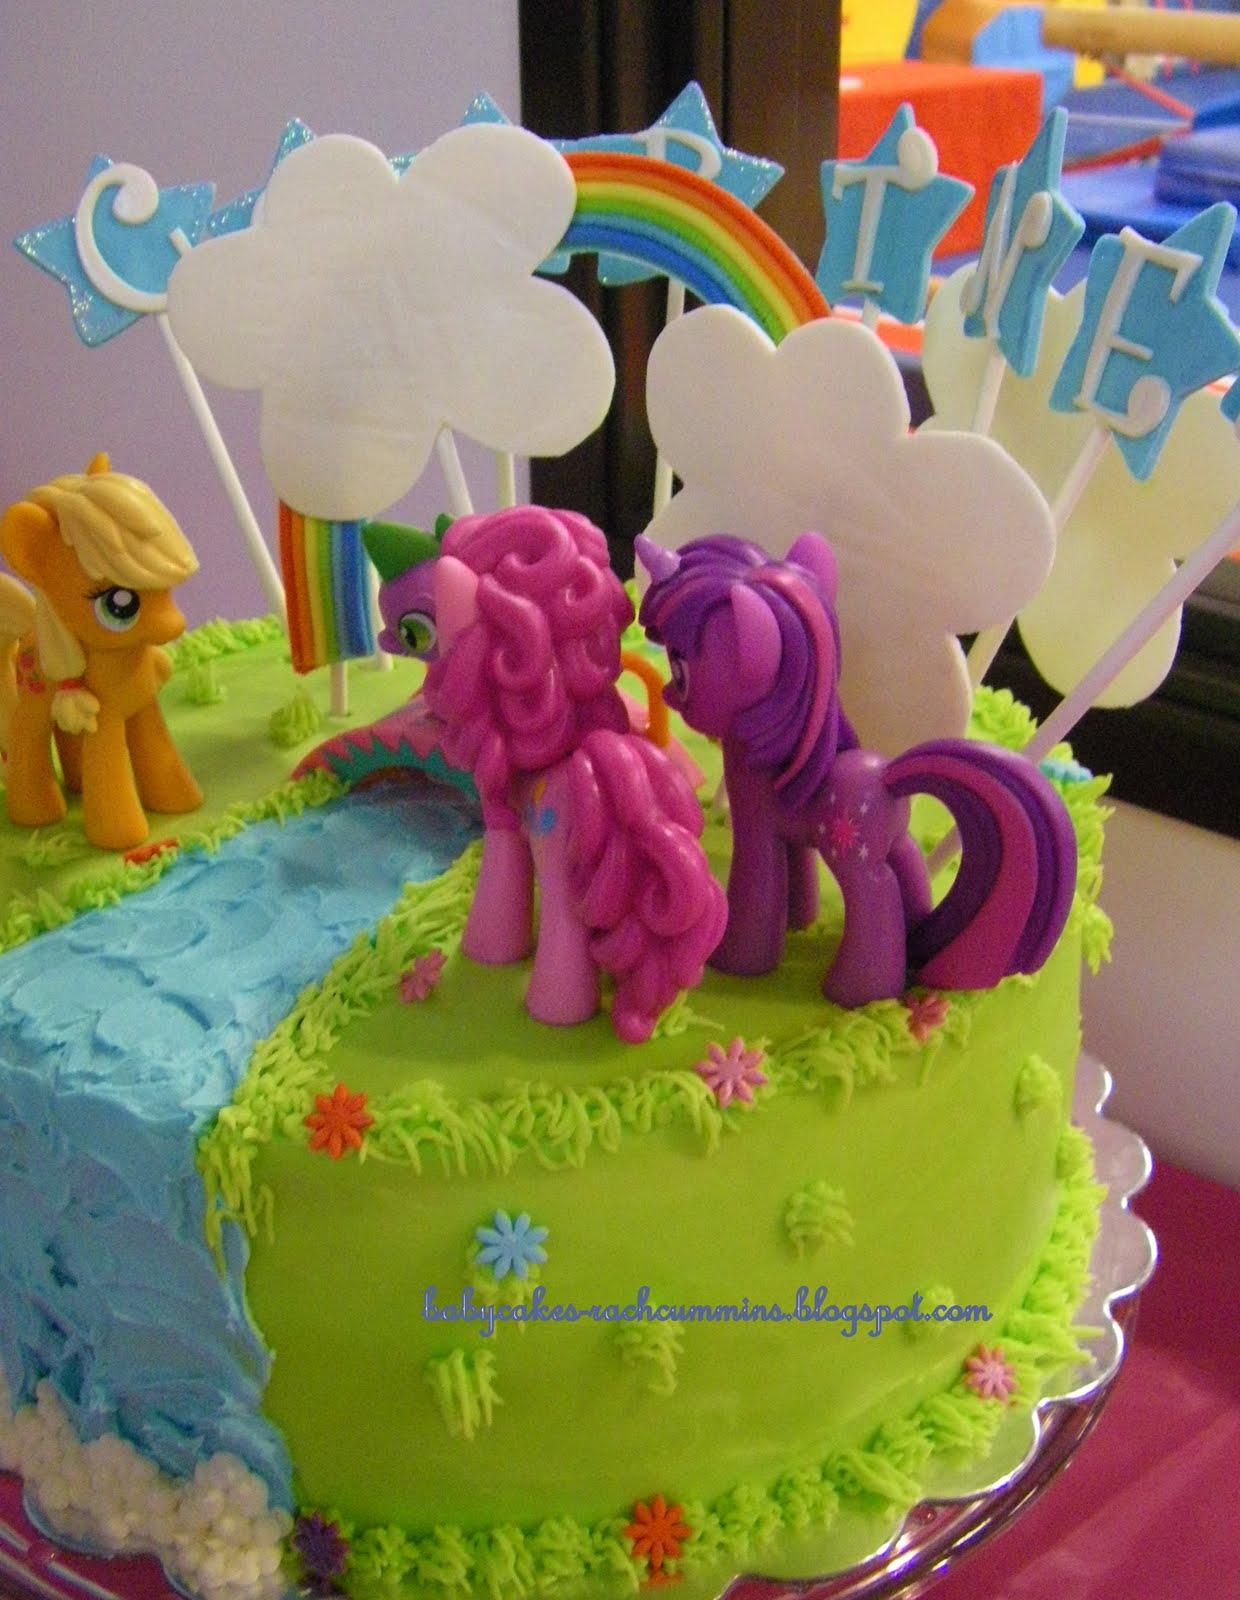 BabyCakes Pony Birthday Cake for Courtney